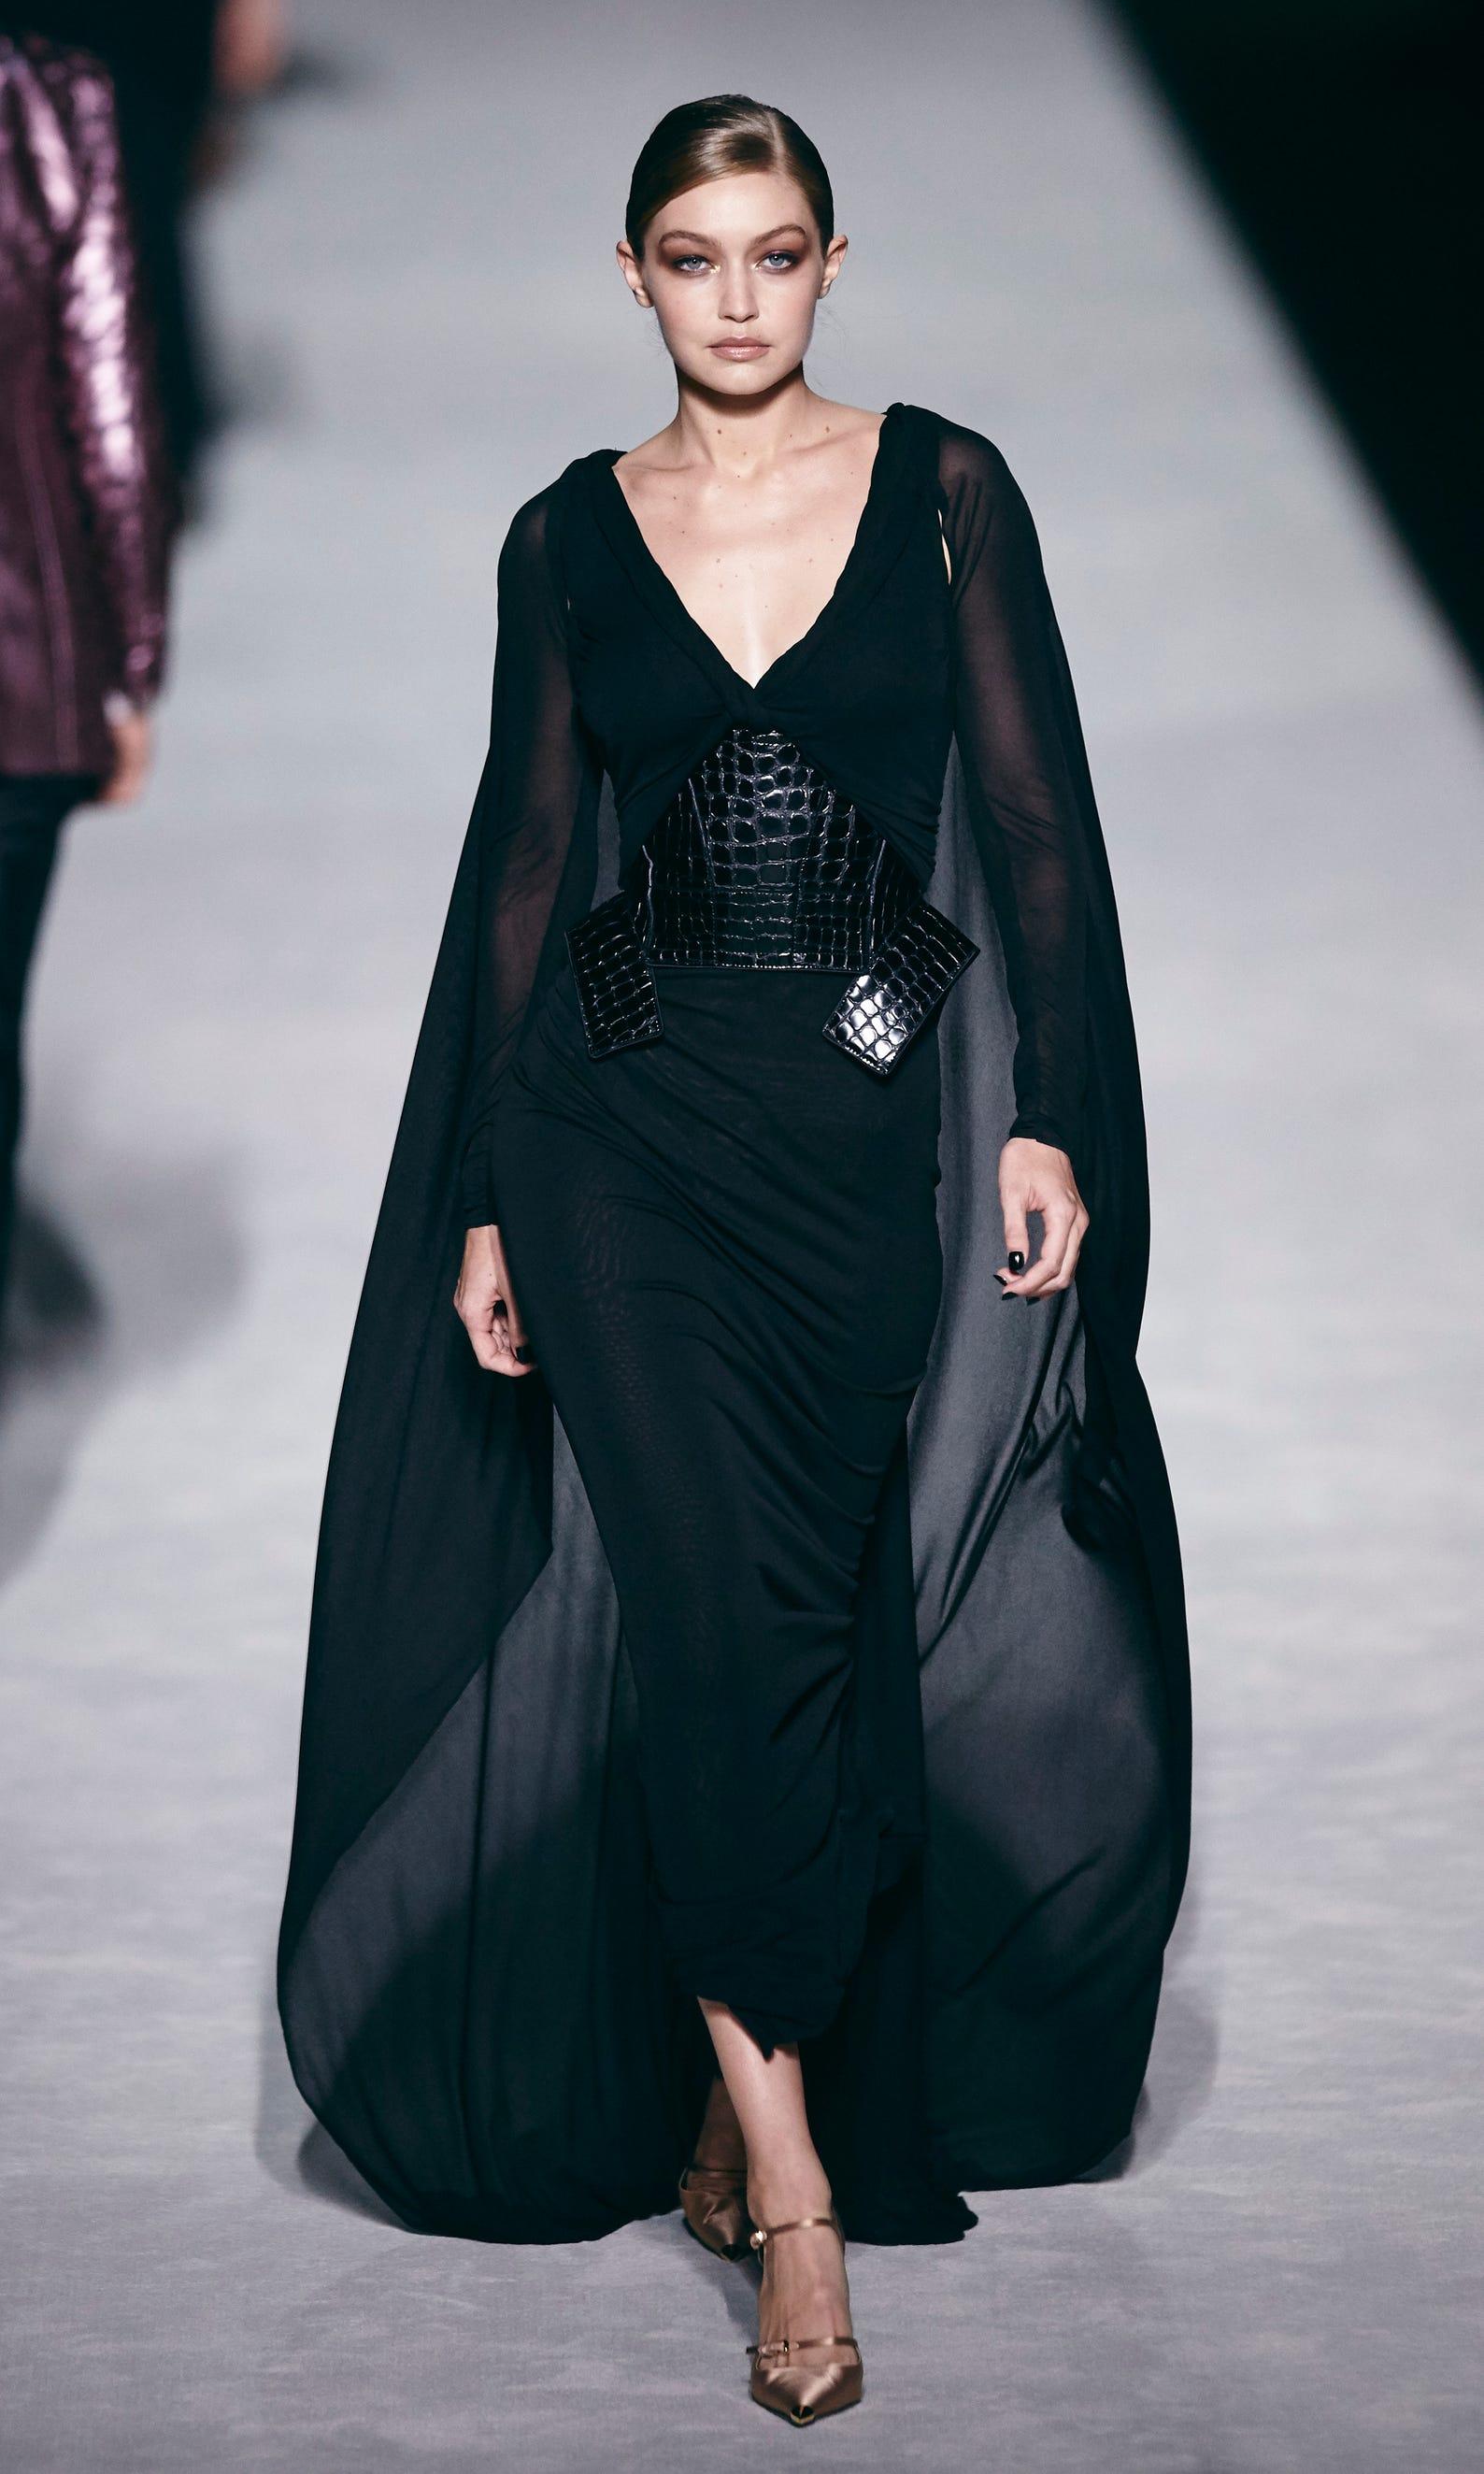 New York Fashion Week Spring 2019 Day 1